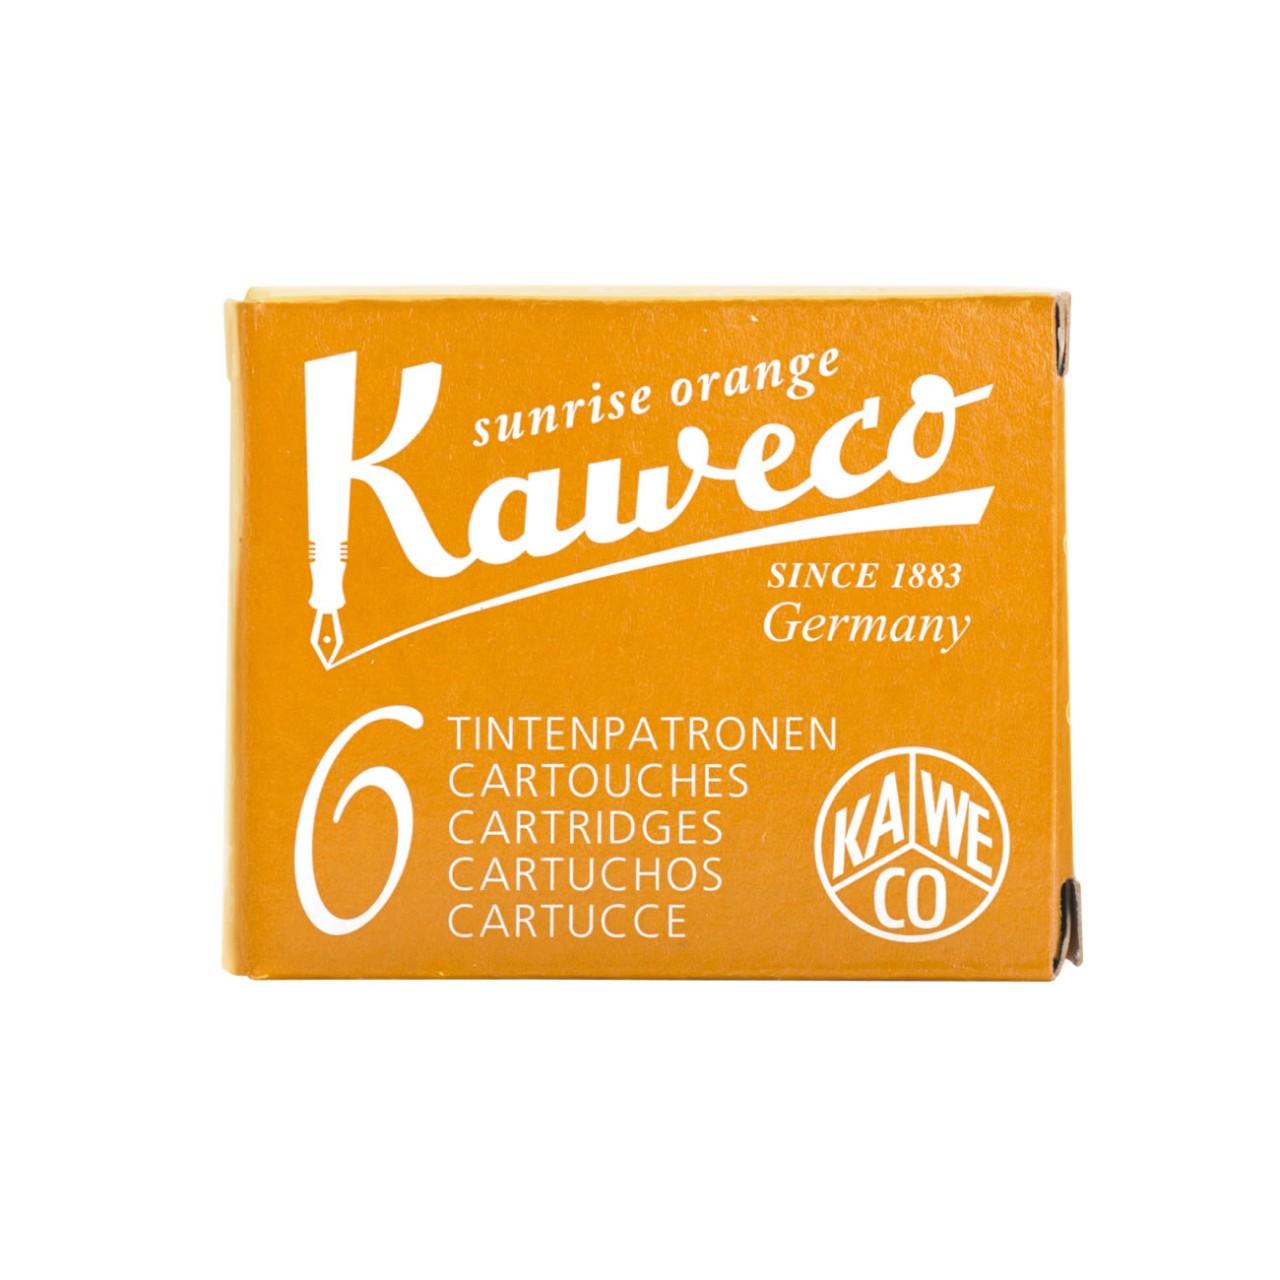 Kaweco Tintenpatronen 6 Stück sonnenorange VE=20 Pack